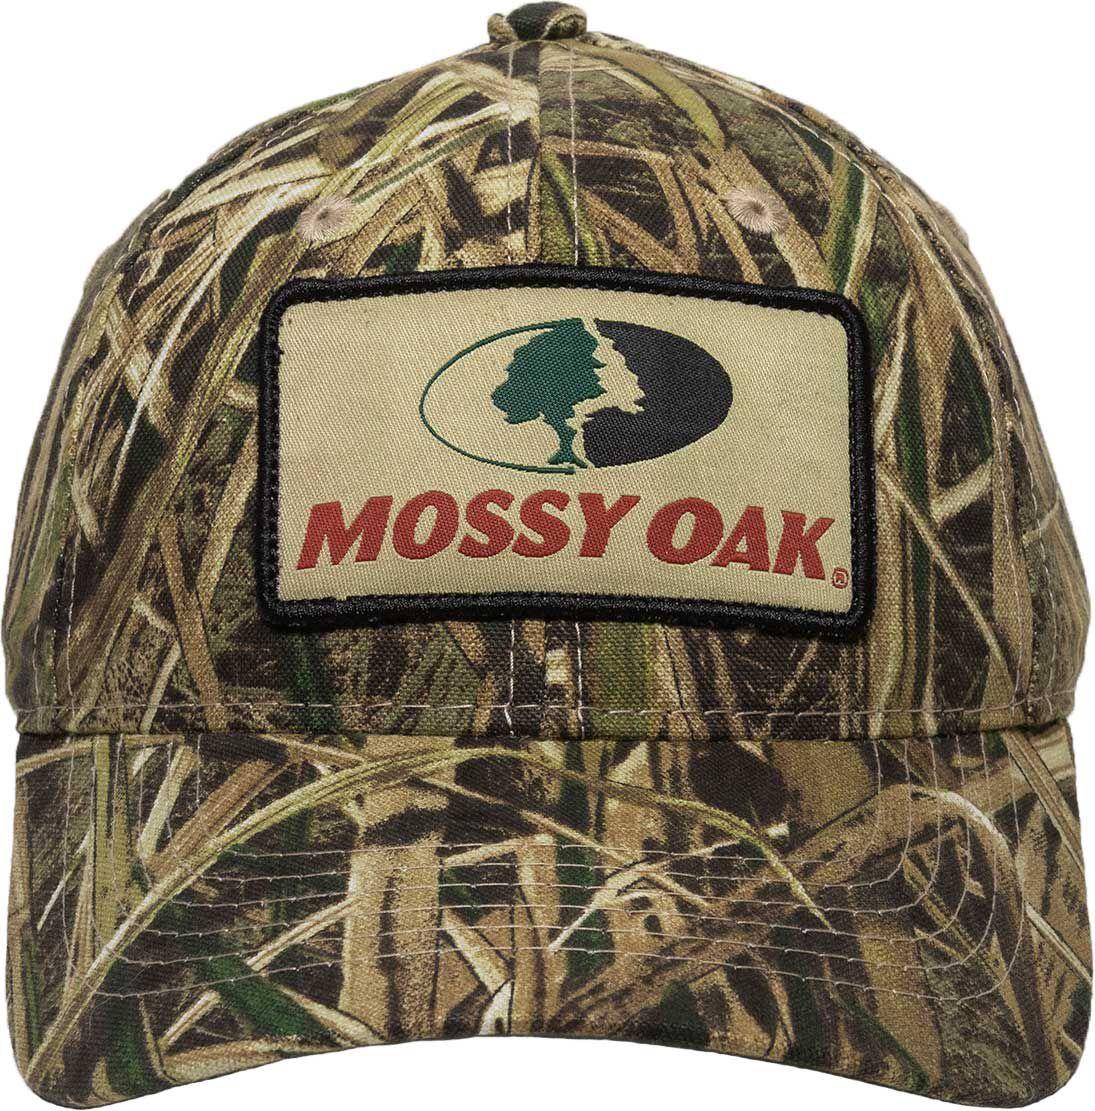 Outdoor Cap Men's Mossy Oak Patch Blades Hat, Size: No Size